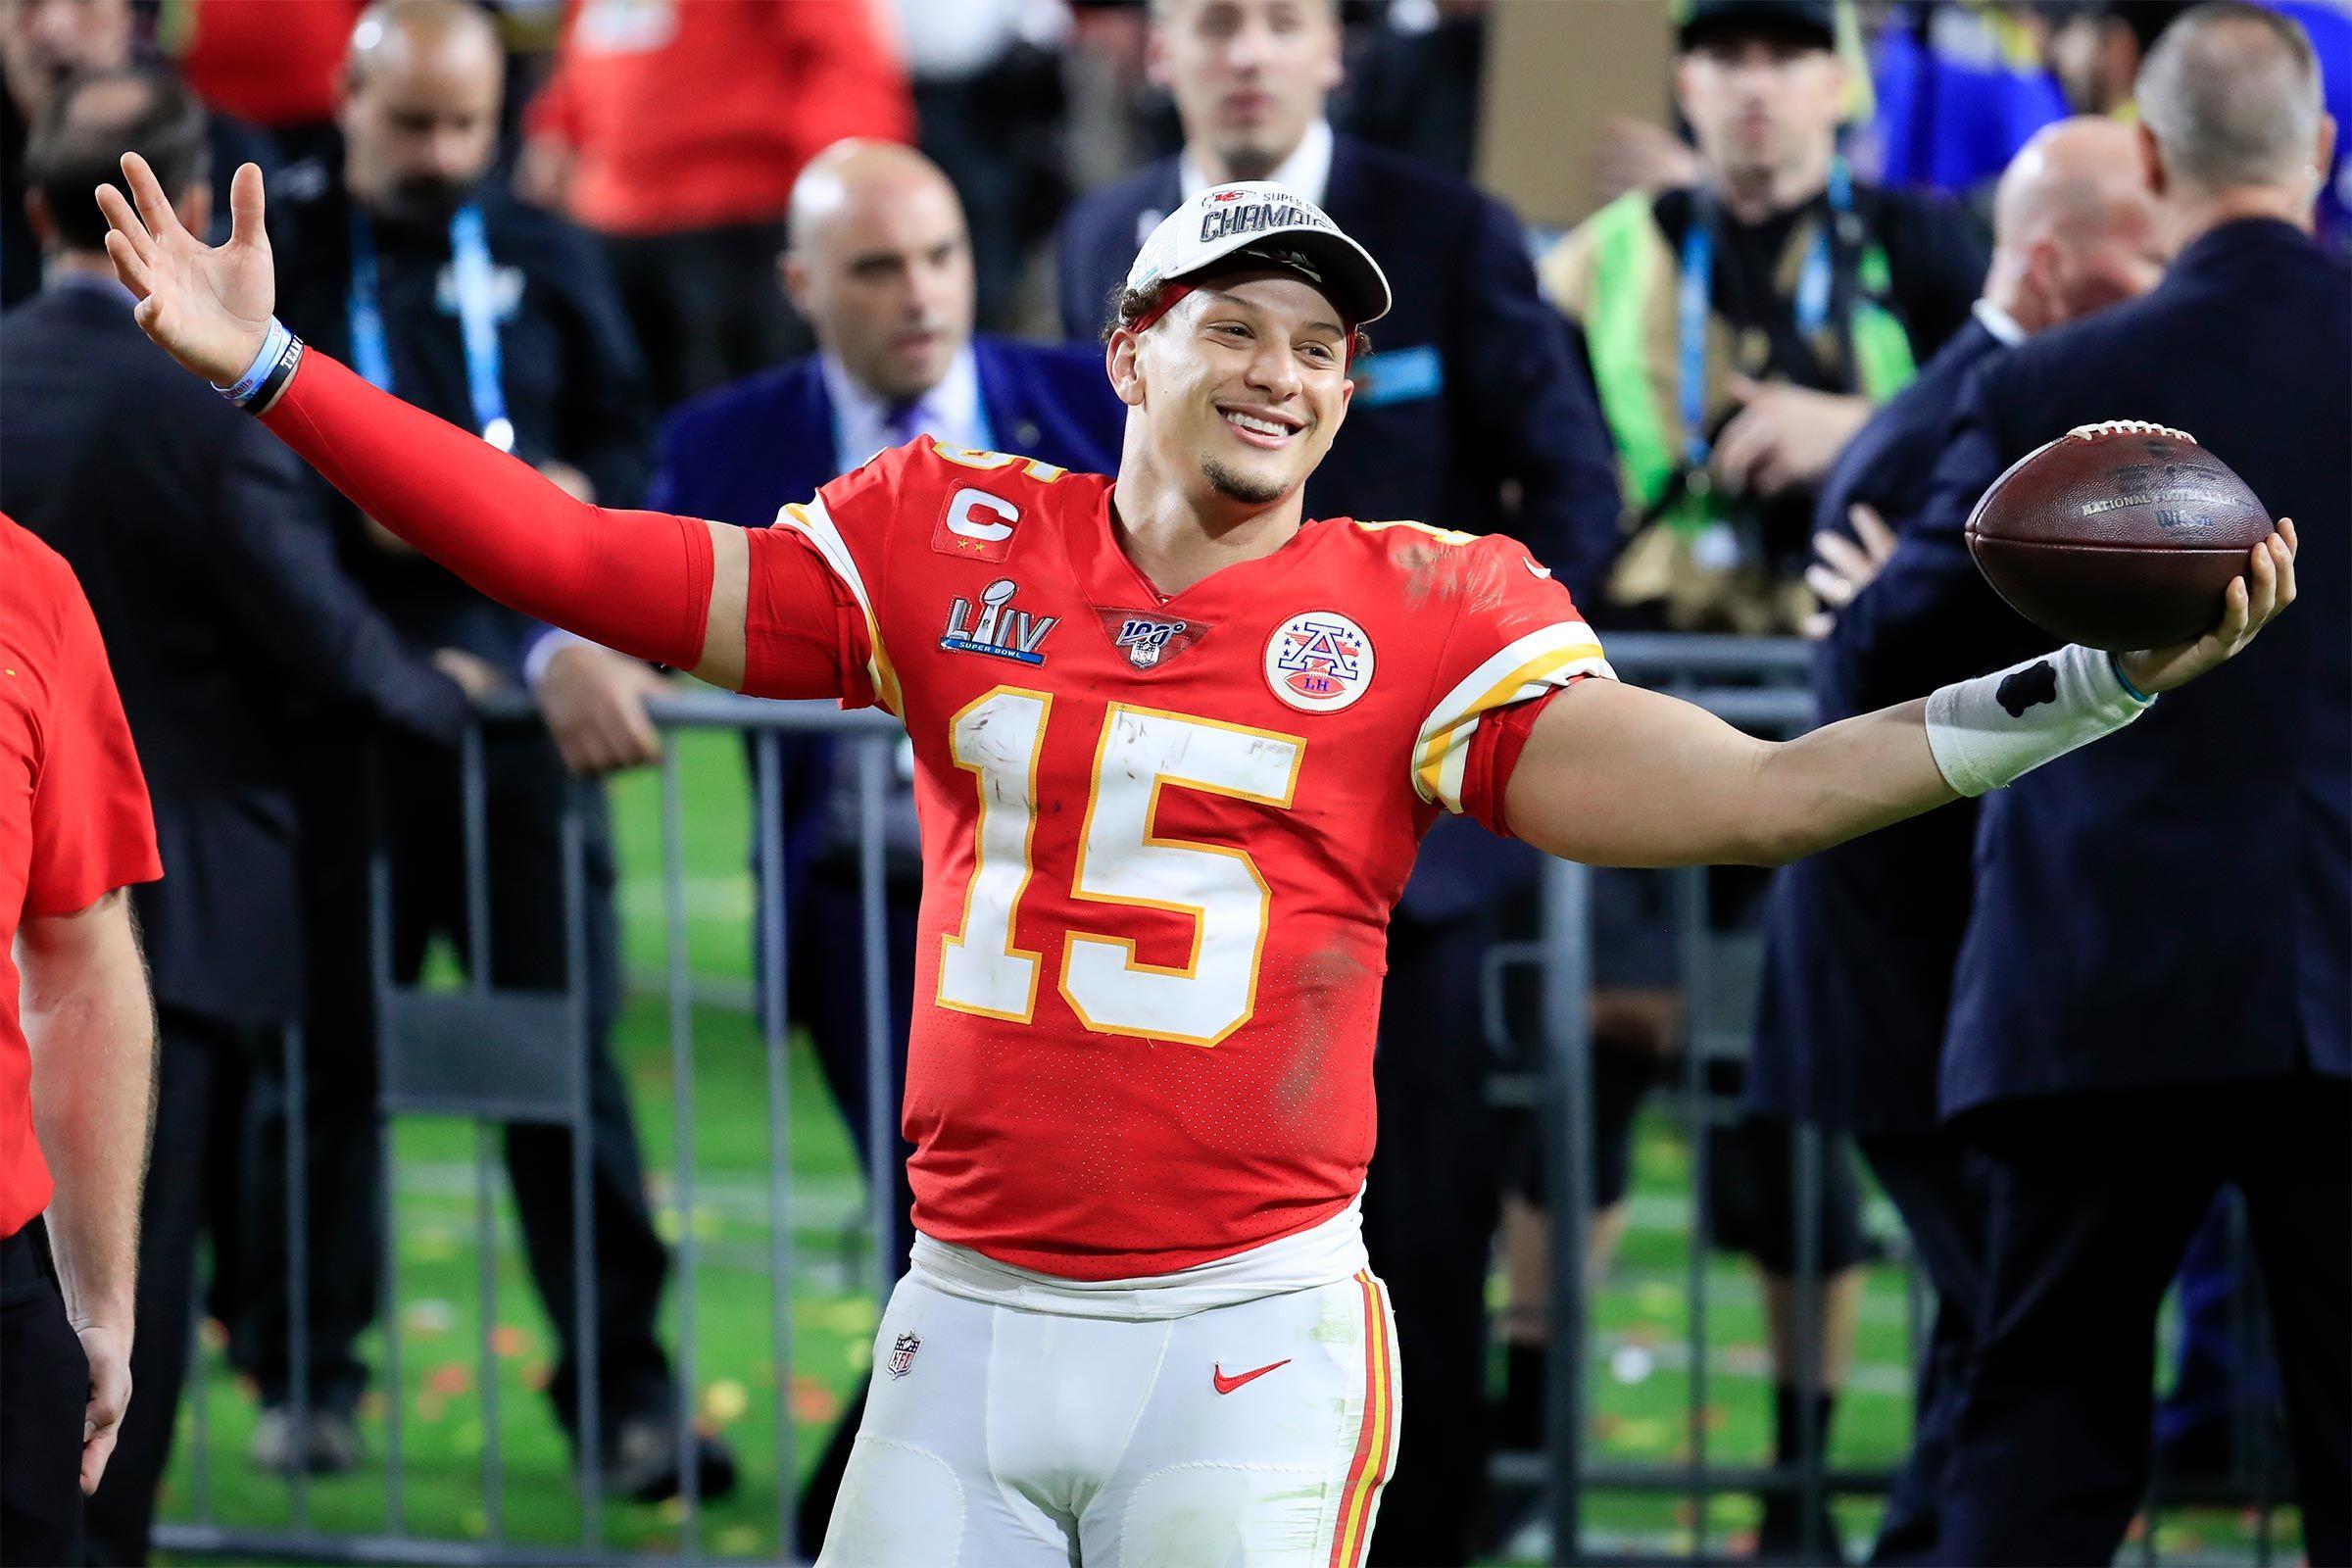 Patrick Mahomes Of The Kansas City Chiefs Wins Super Bowl 2020 Mvp In 2020 Kansas City Chiefs Kansas City Kansas City Chiefs Football